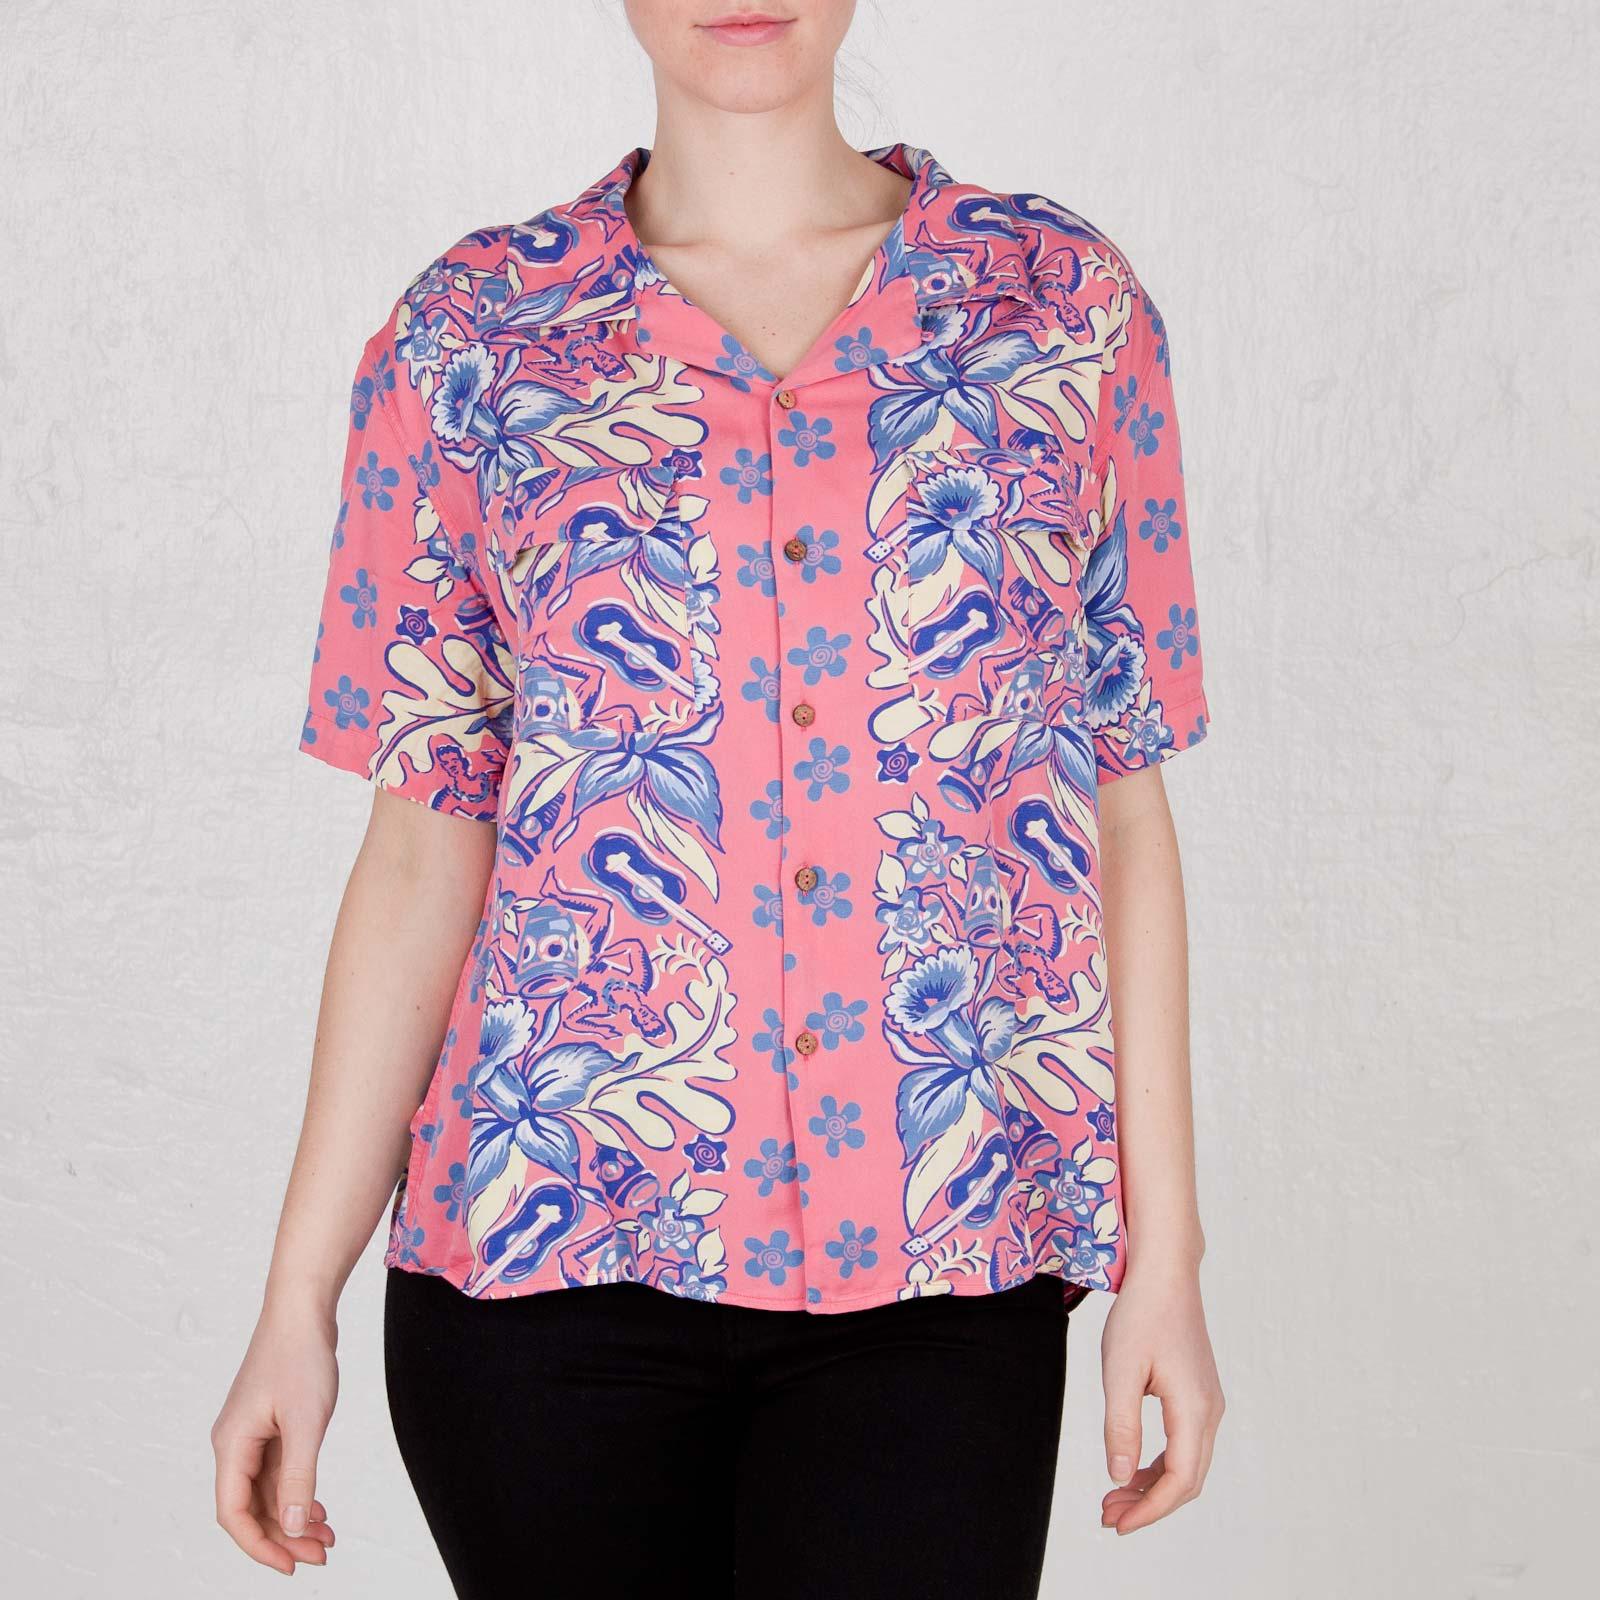 477834d2 Levis Vintage Clothing Hawaiian Shirt – EDGE Engineering and ...